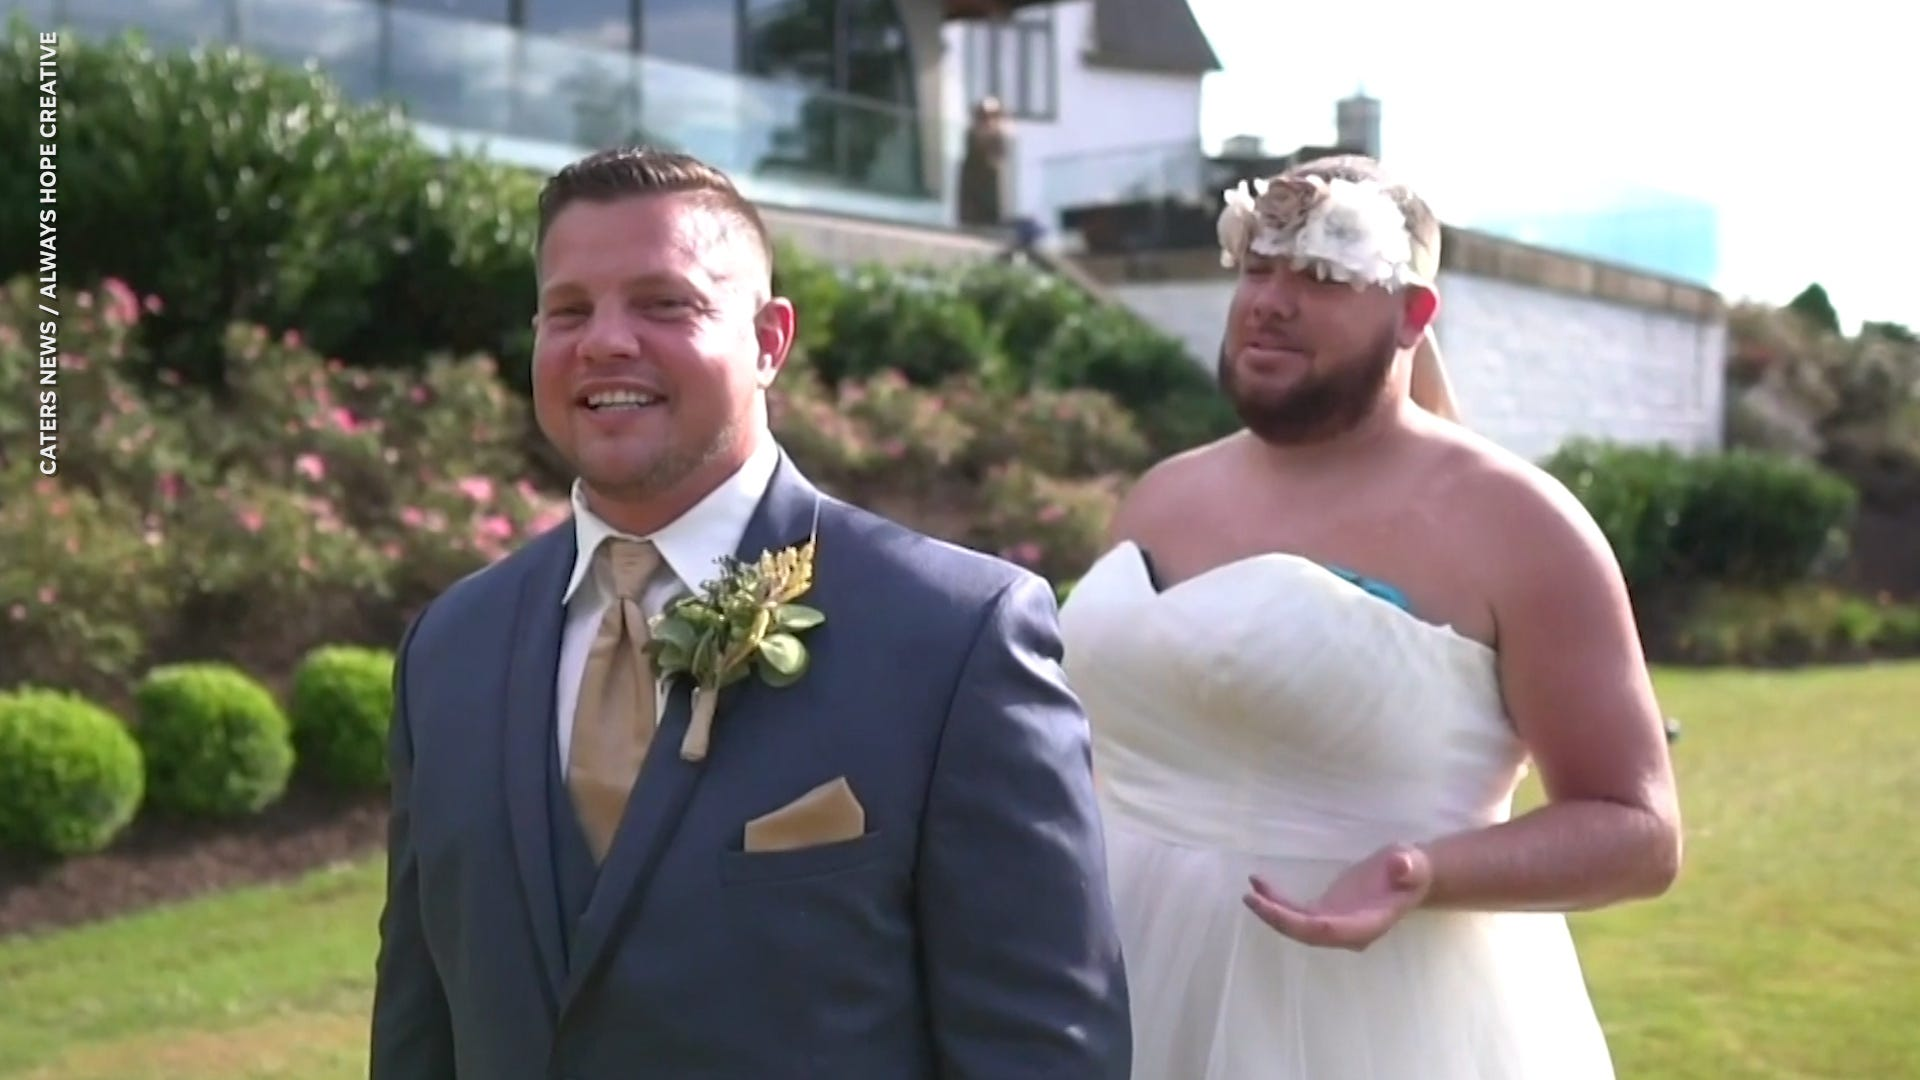 Best man pranks groom by wearing wedding dress for first look